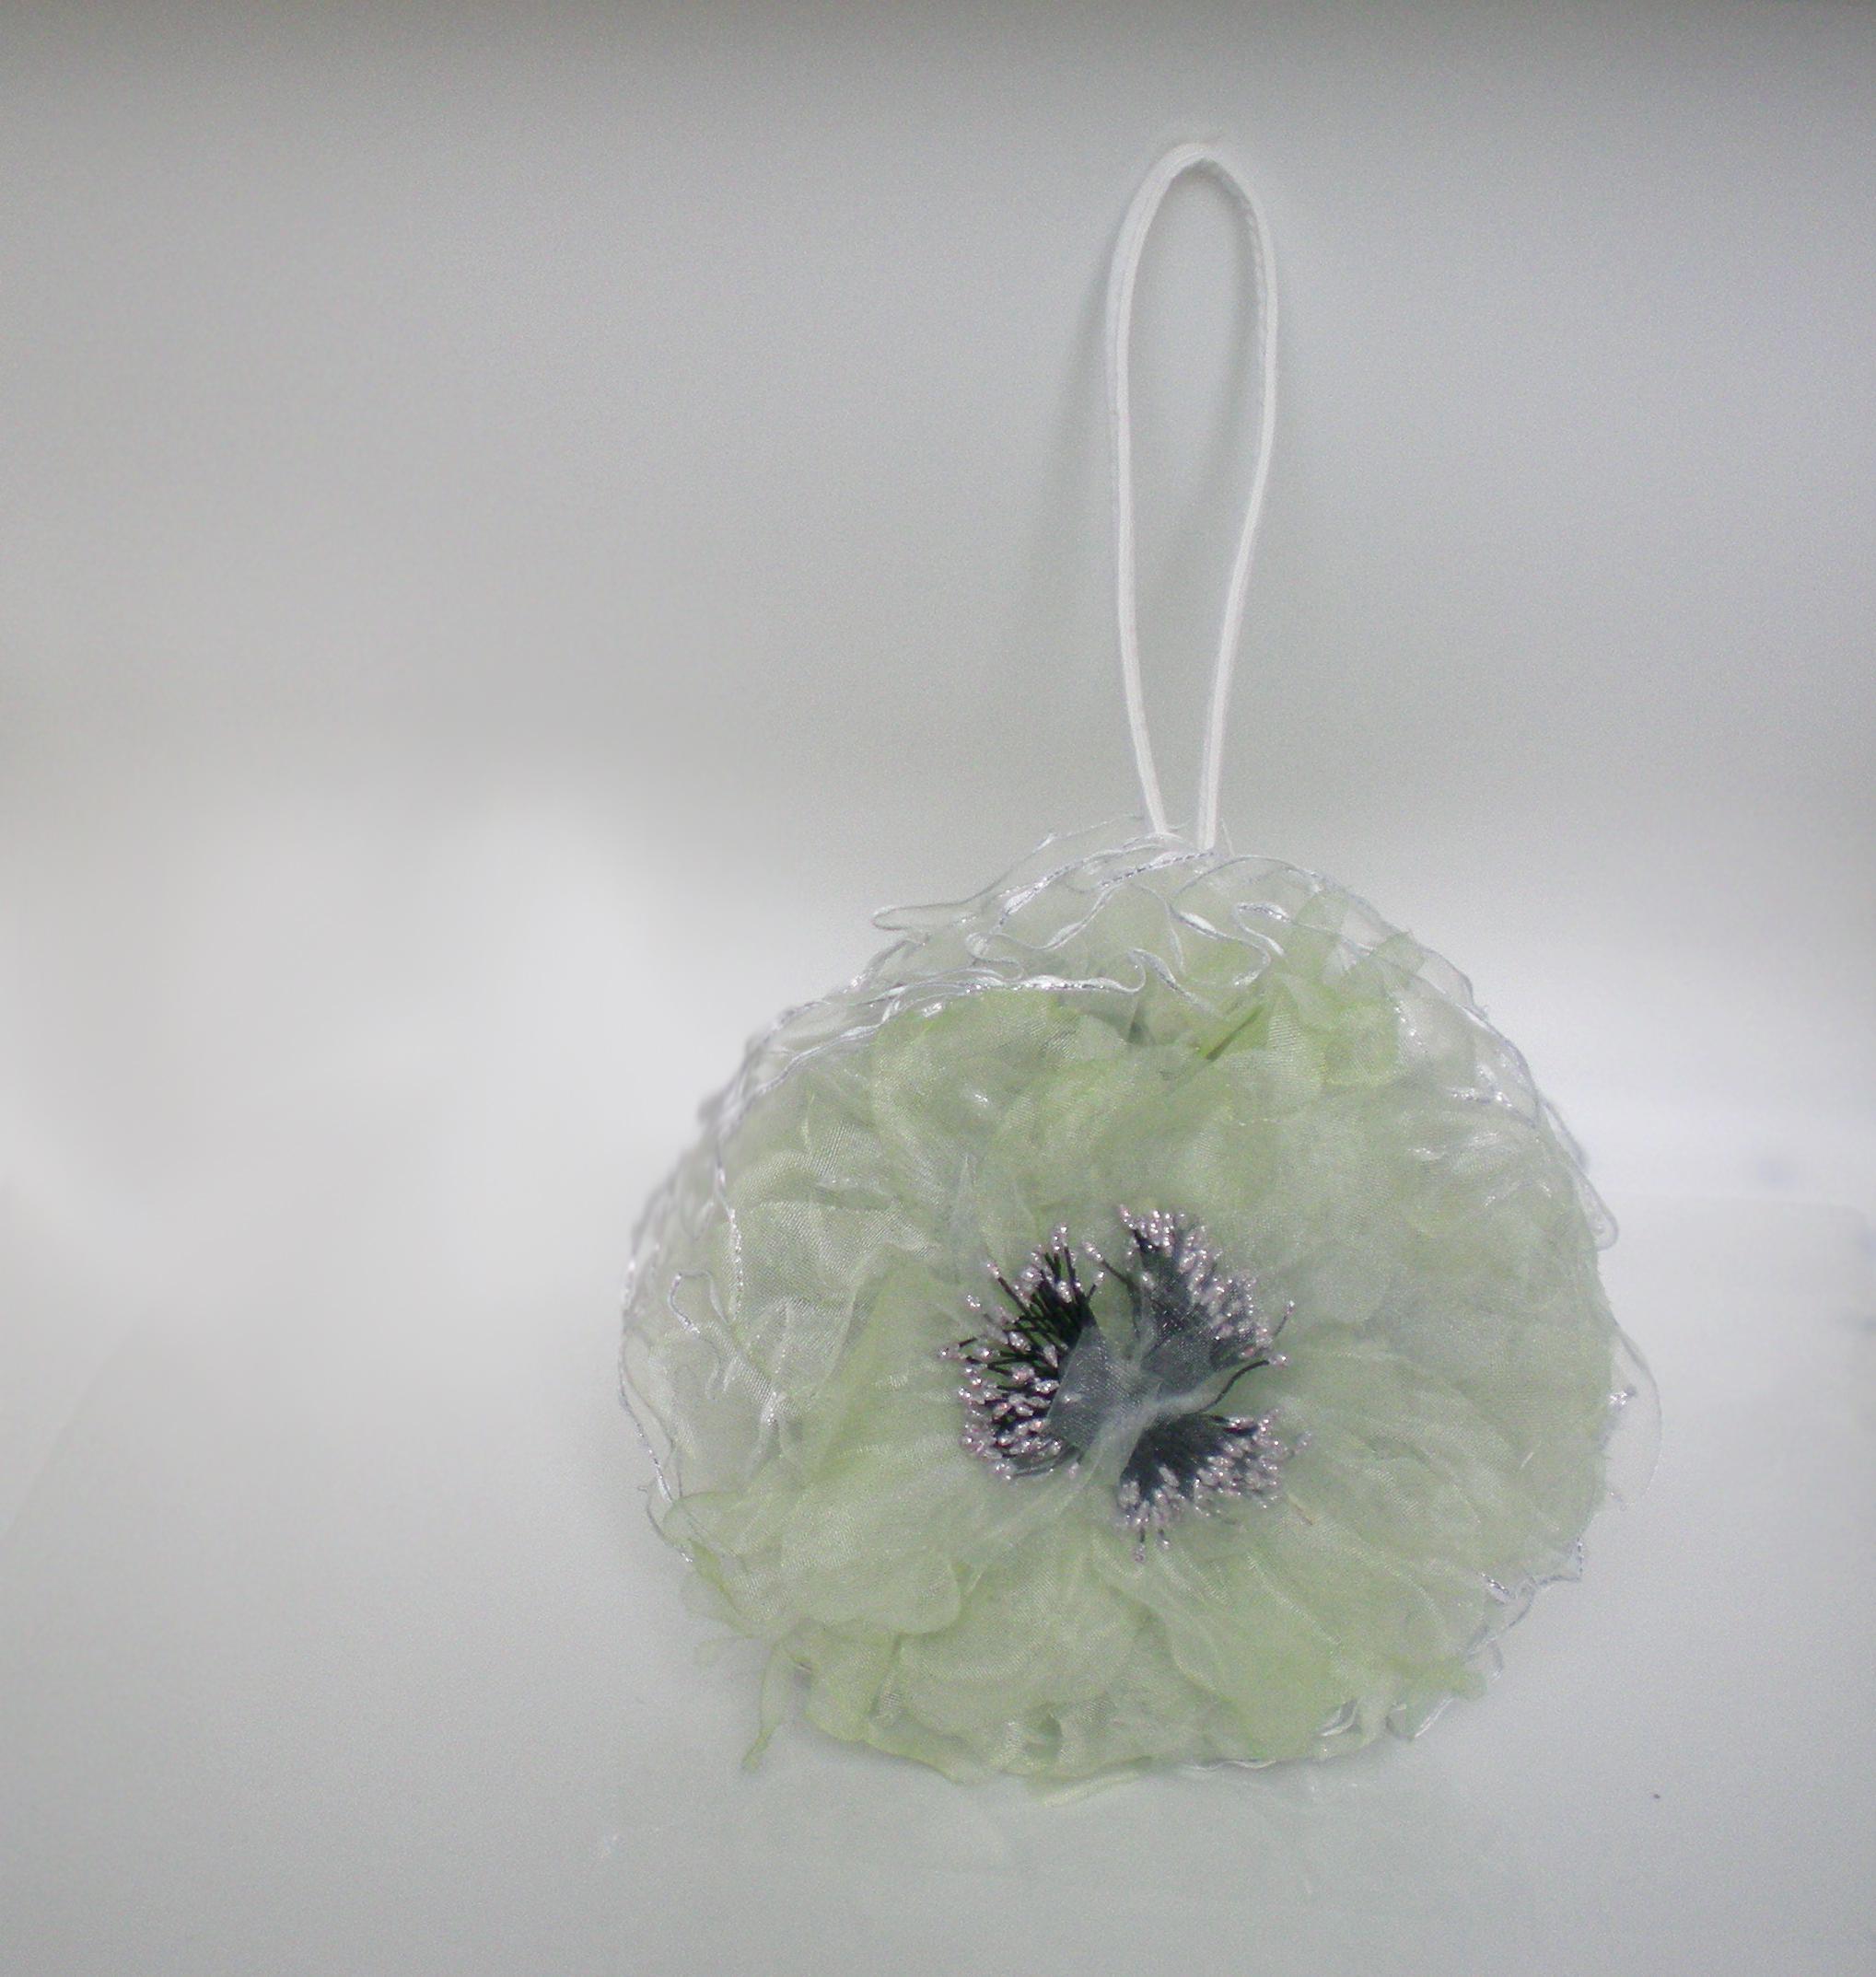 24d61ee694 Free Shipping Flower Girl Purse - Satin Clutch - Organza Bridemaid Clutch-  Bridemaid